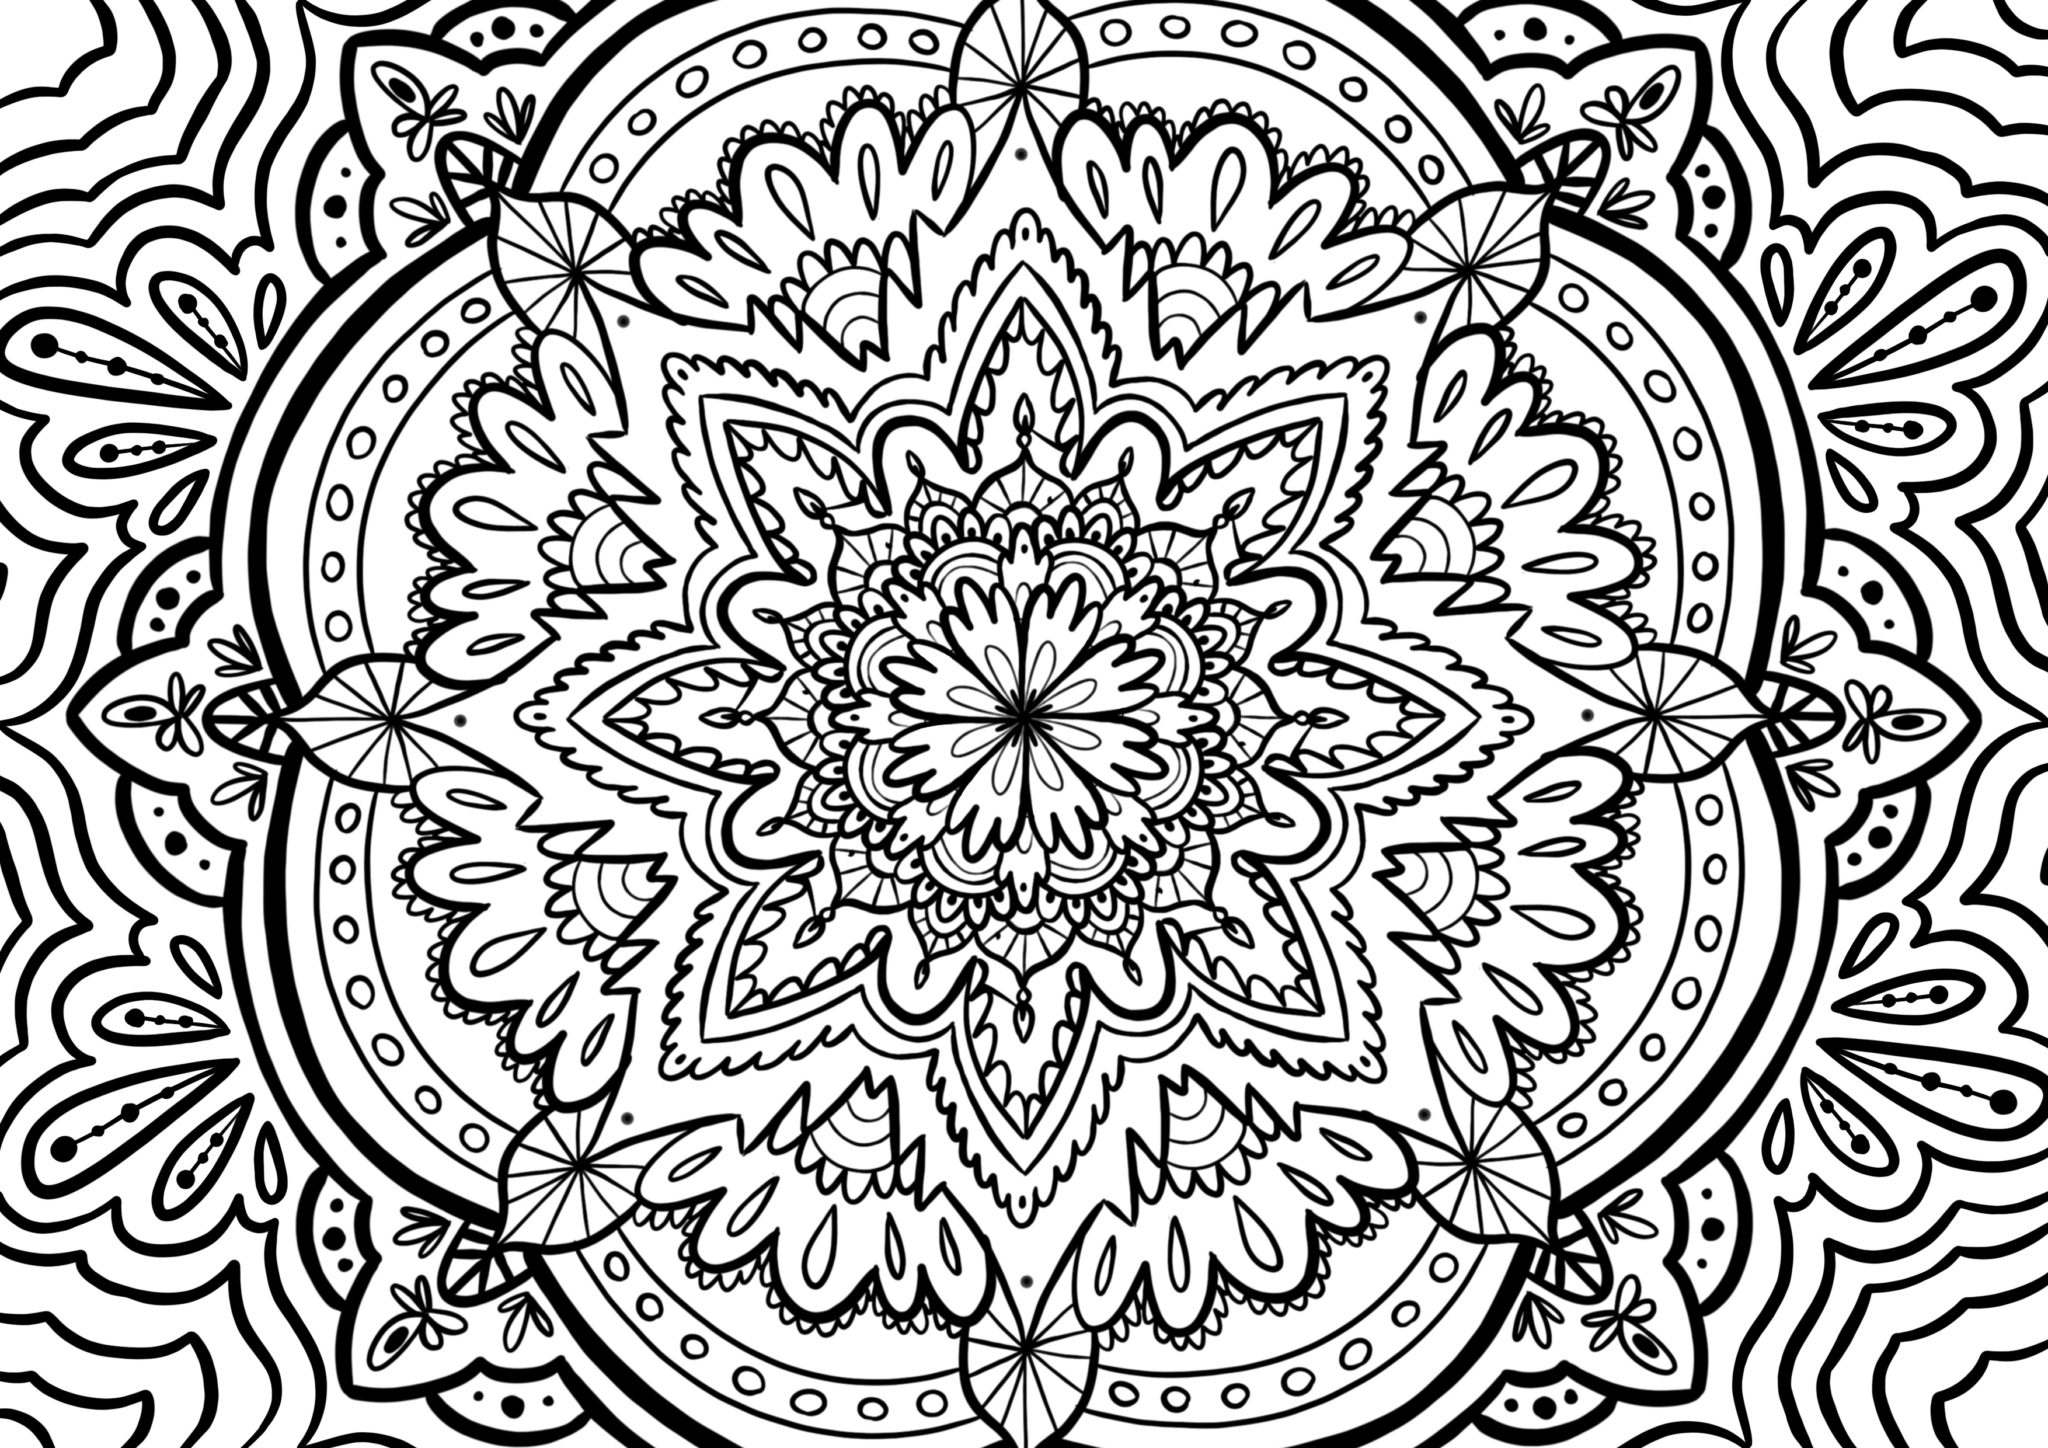 Coloriage anti-stress mandala traditionnel pour l'ete